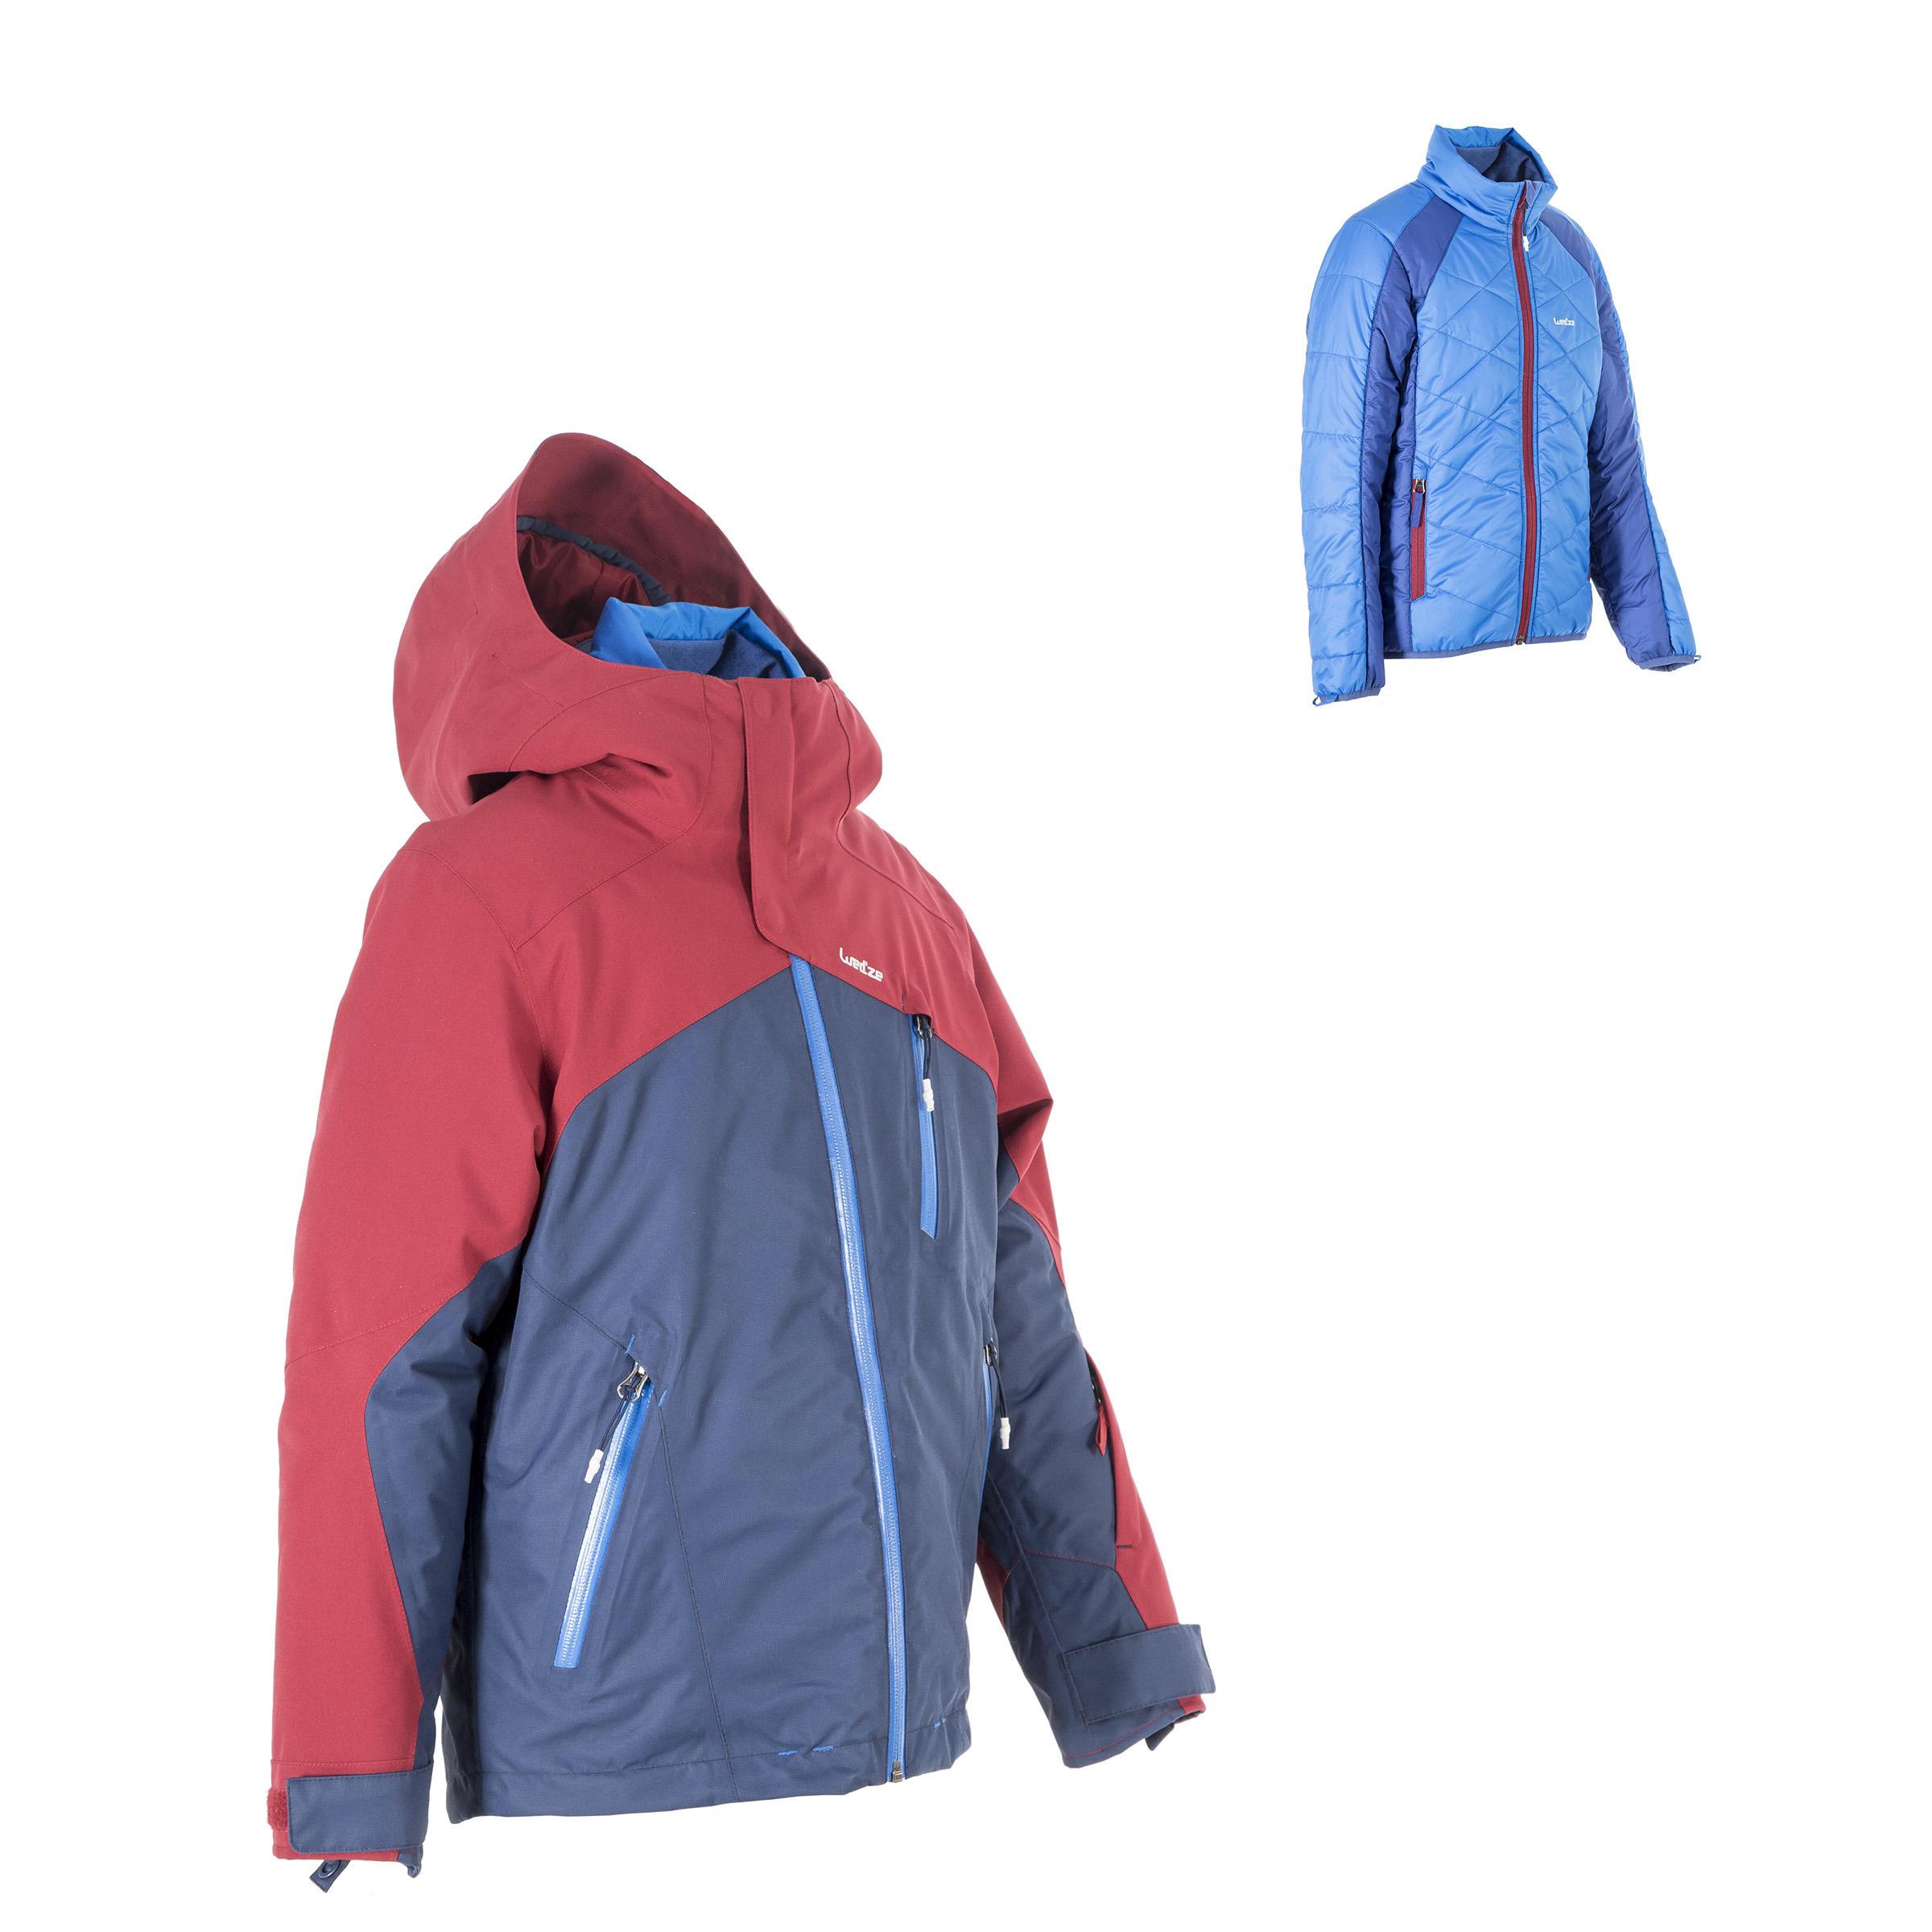 Jungen,Kinder Skijacke All Mountain Kinder 990 blau bordeaux | 03608449861670